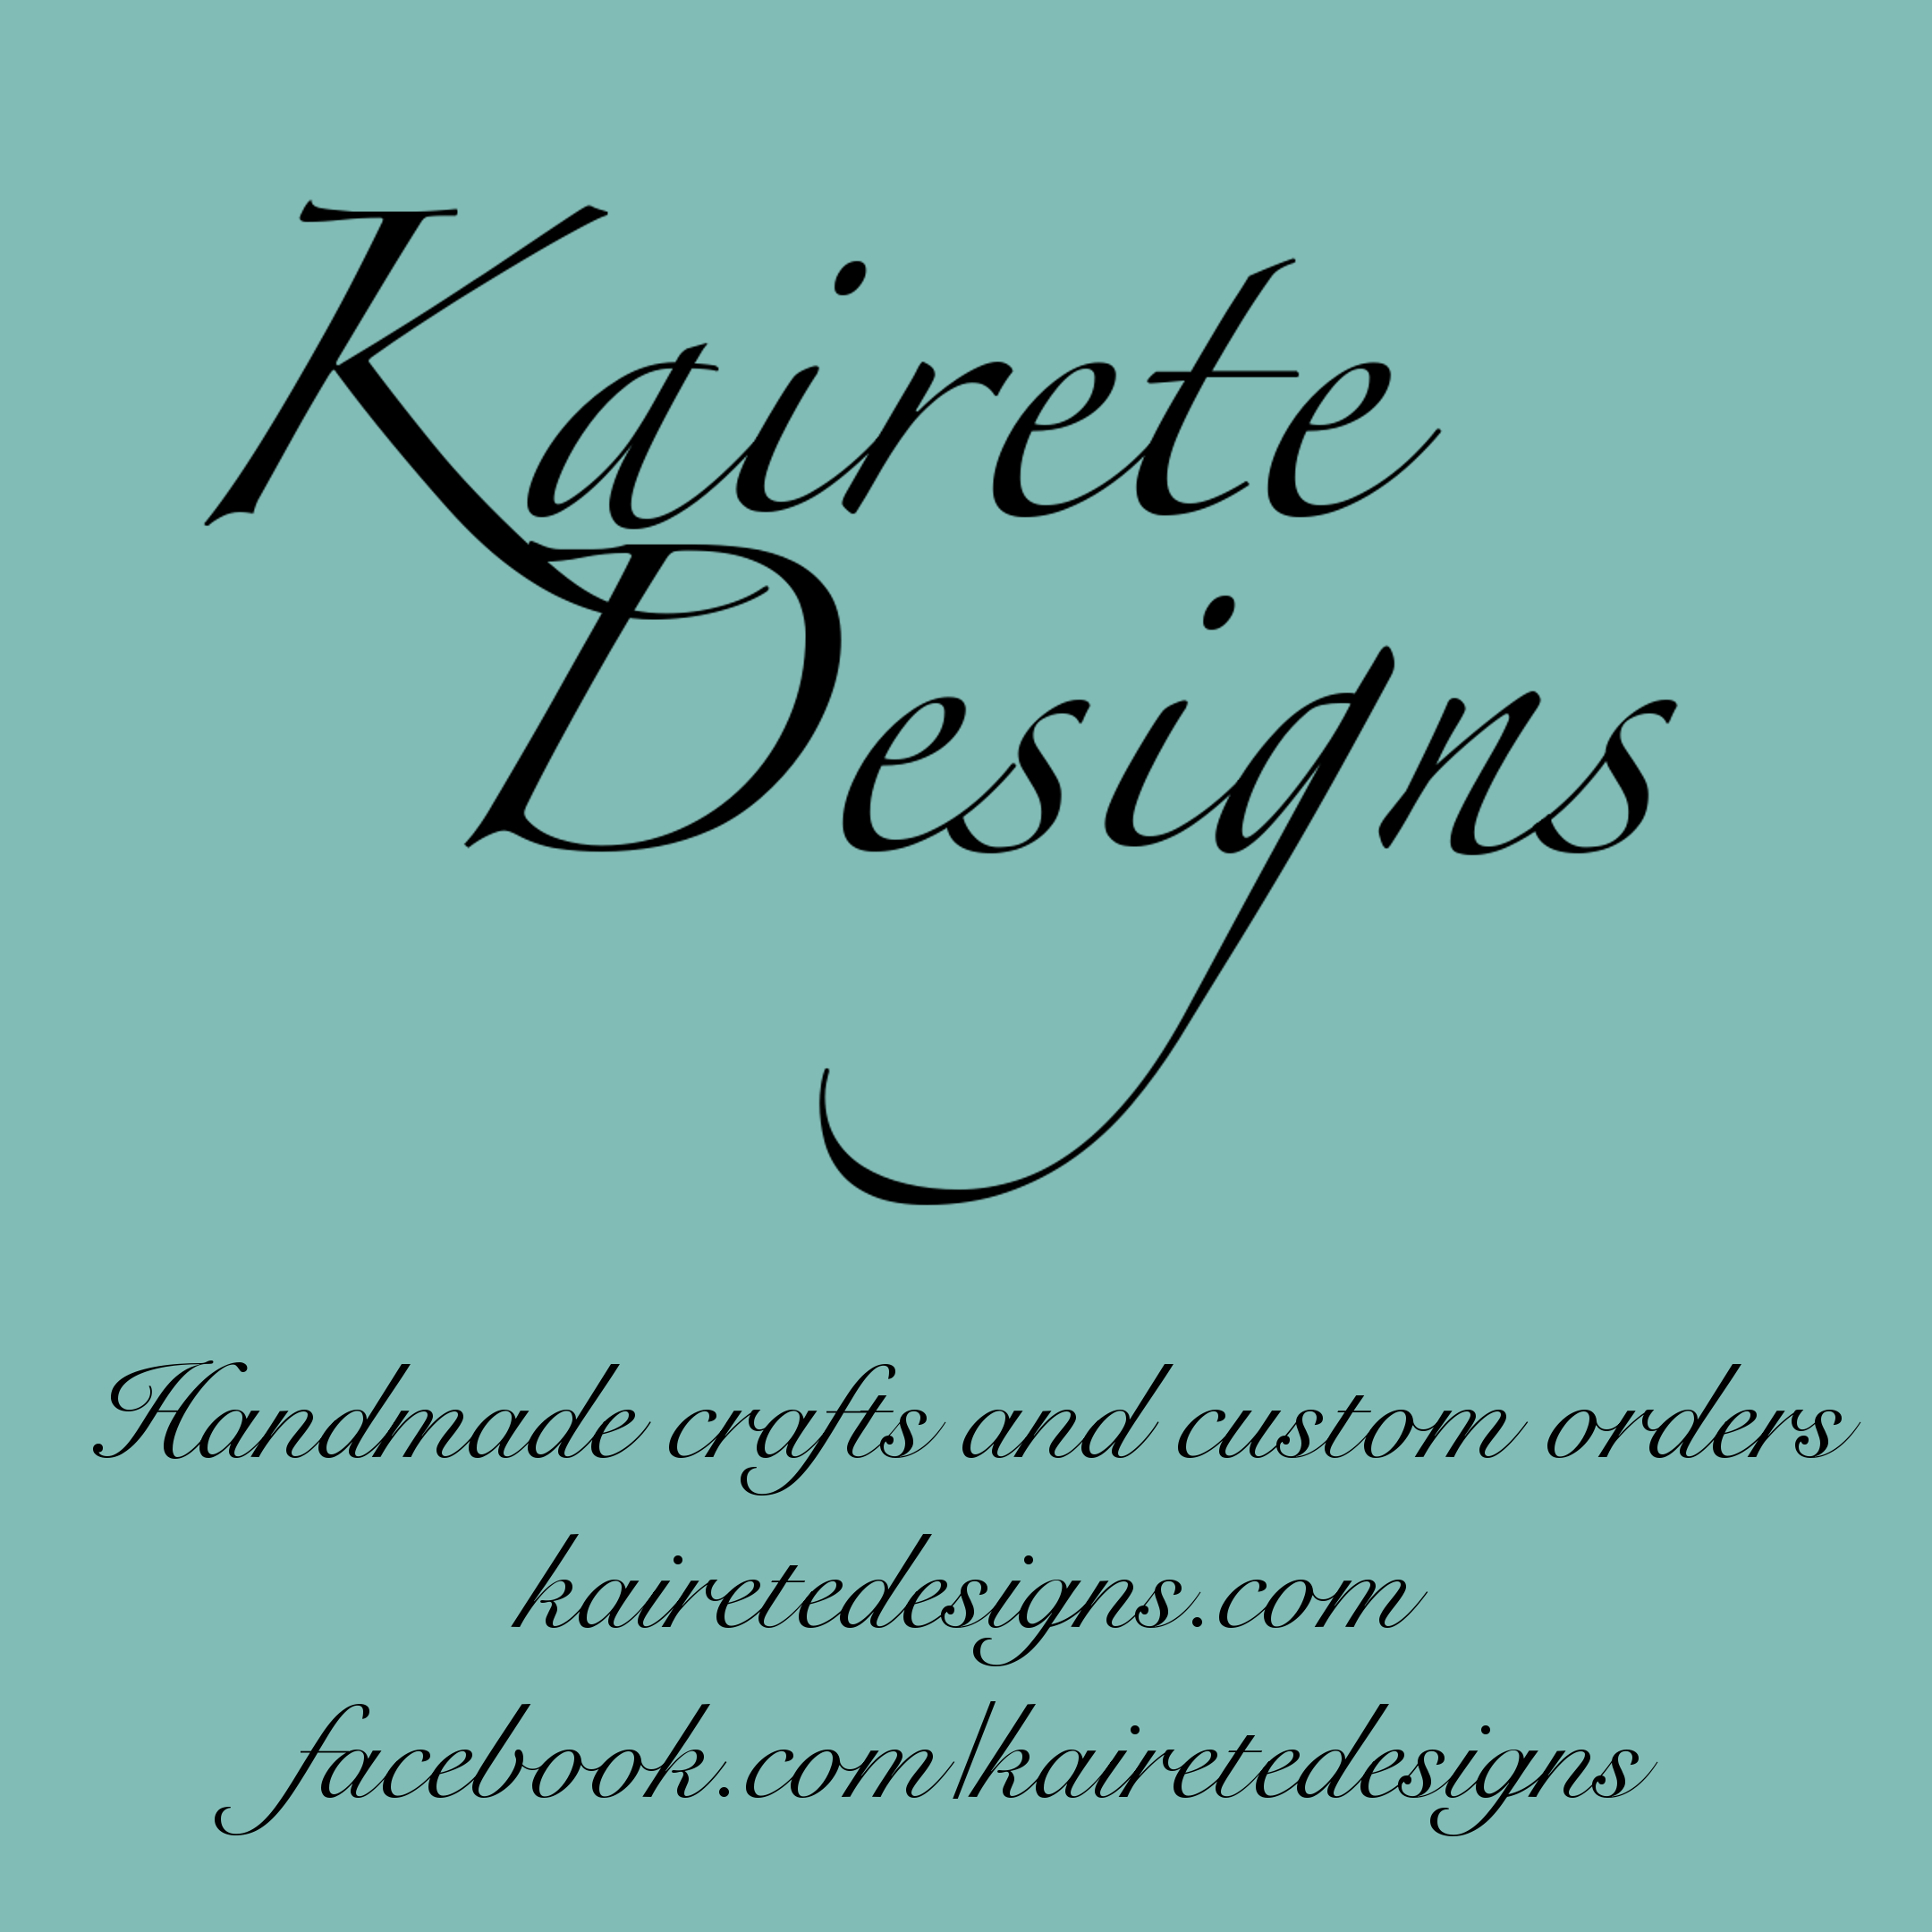 Kairete Designs